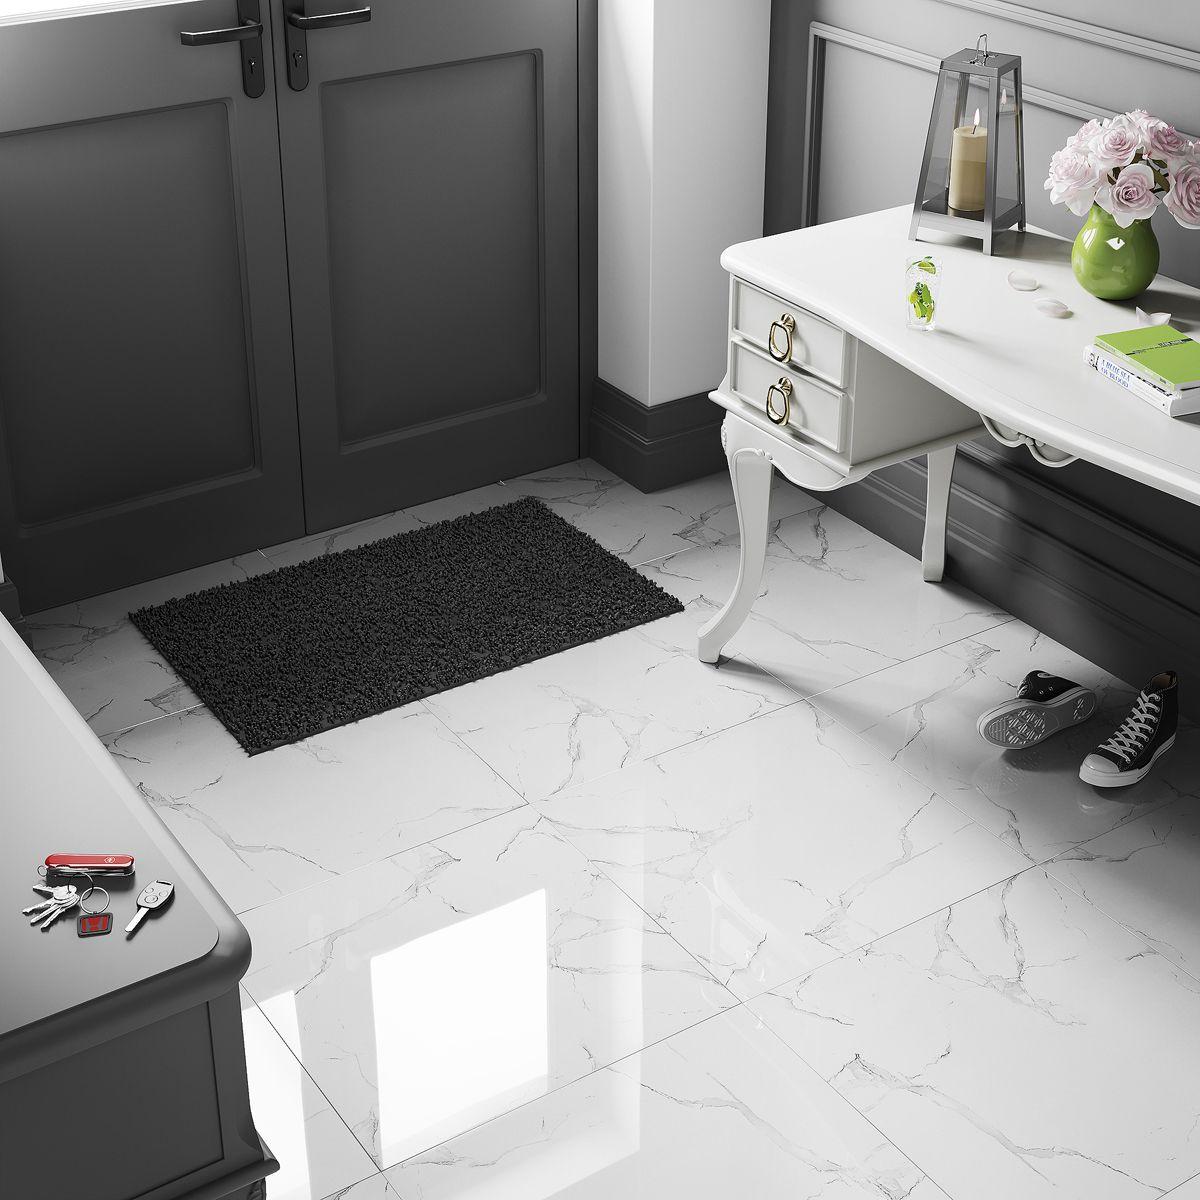 White Marble High Gloss size 60x60cm Top Ceramics